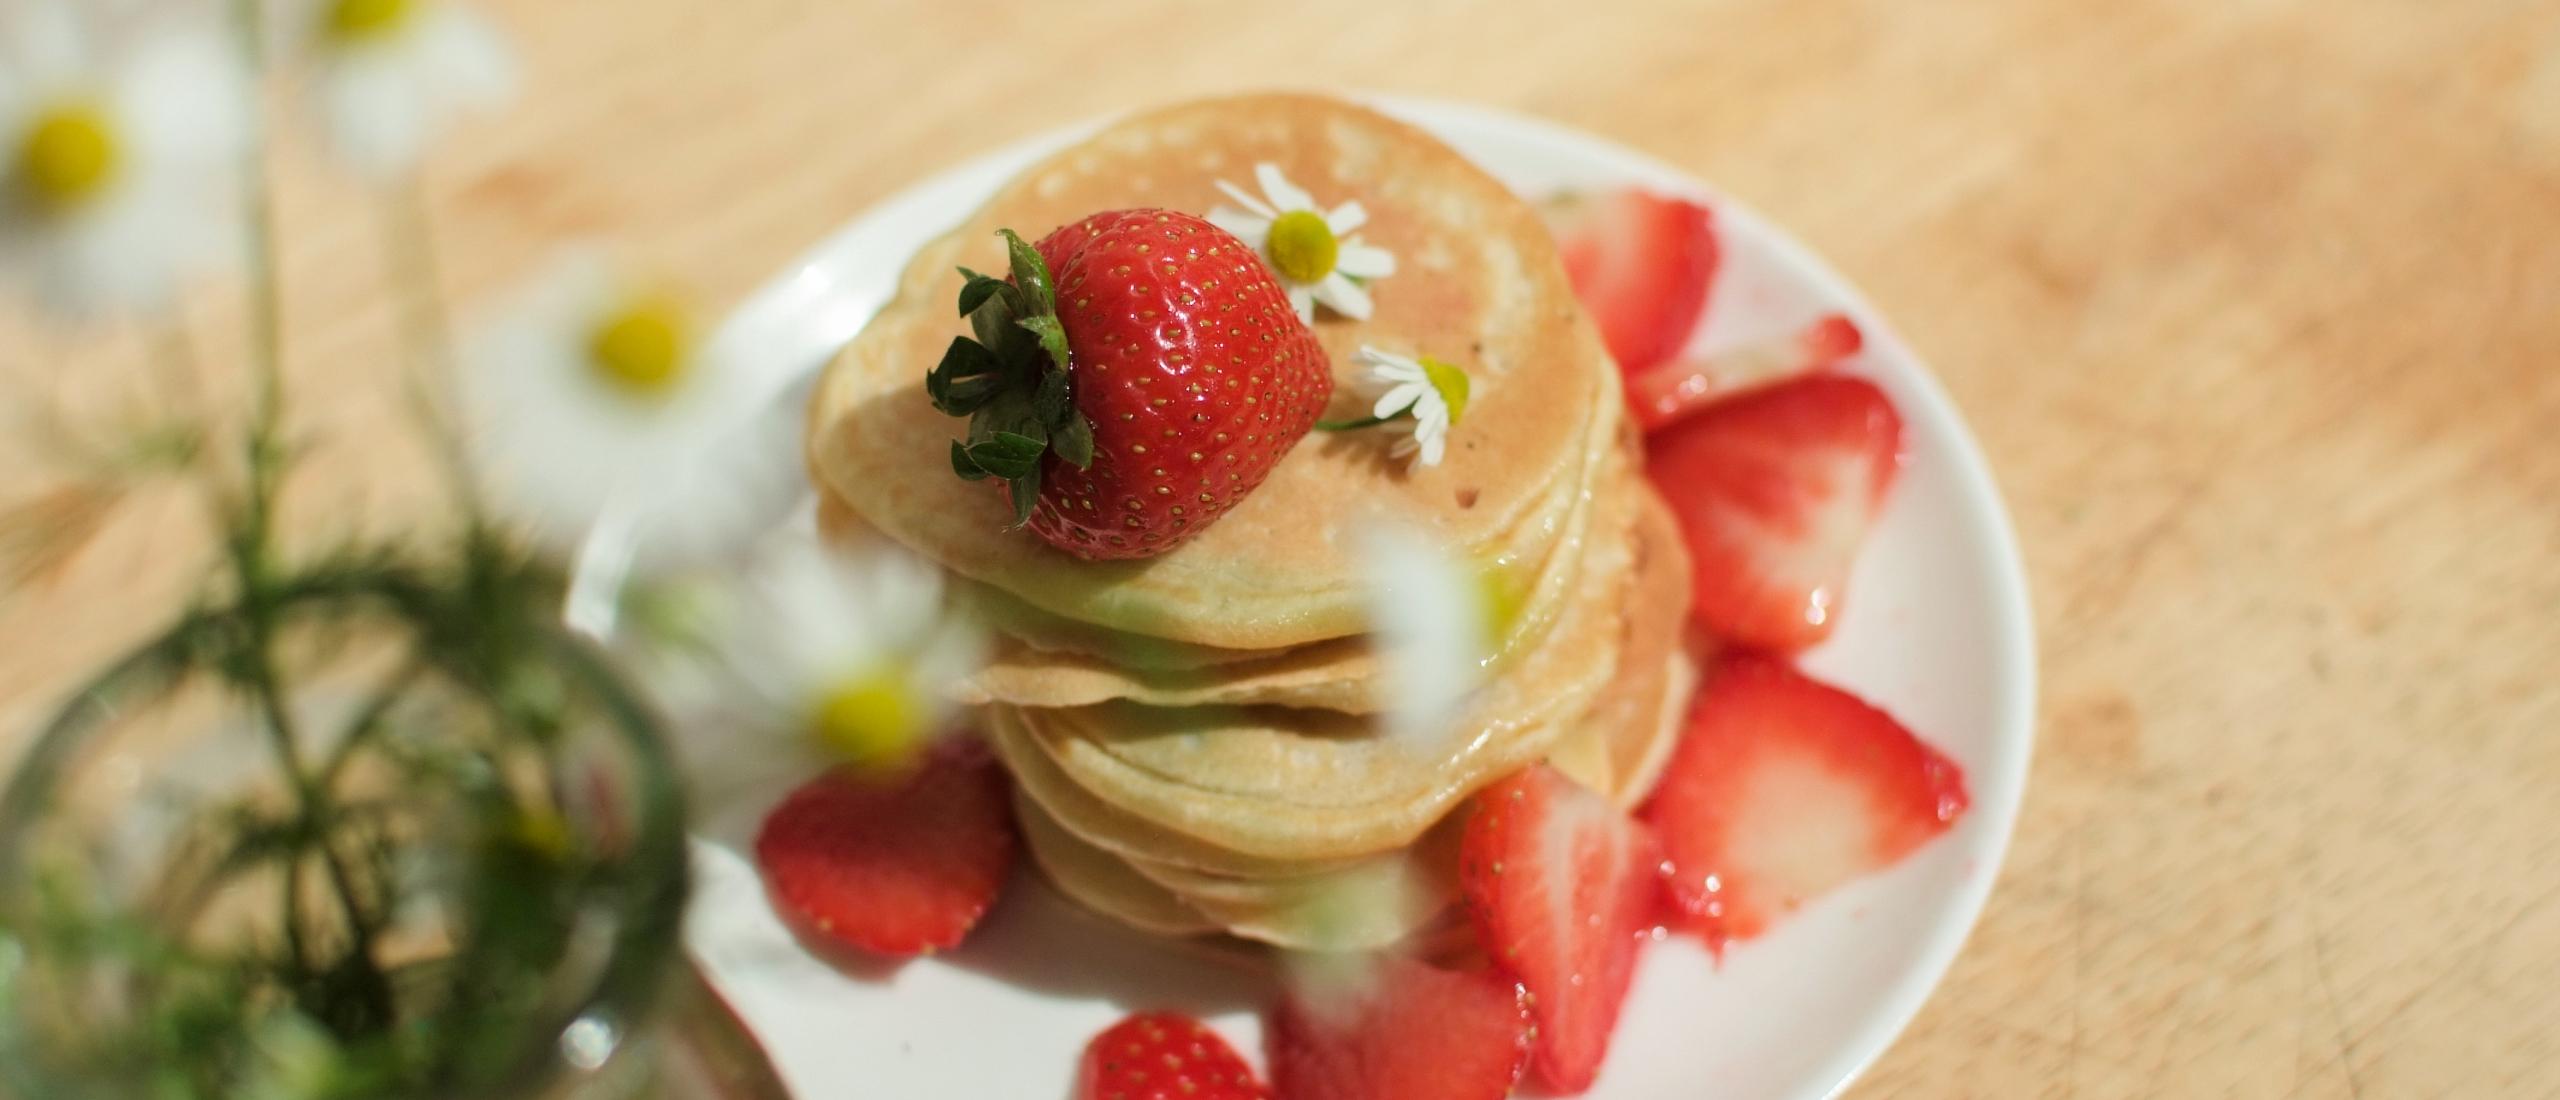 Recept: kamillepannenkoekjes met aardbeien en kamillesiroop